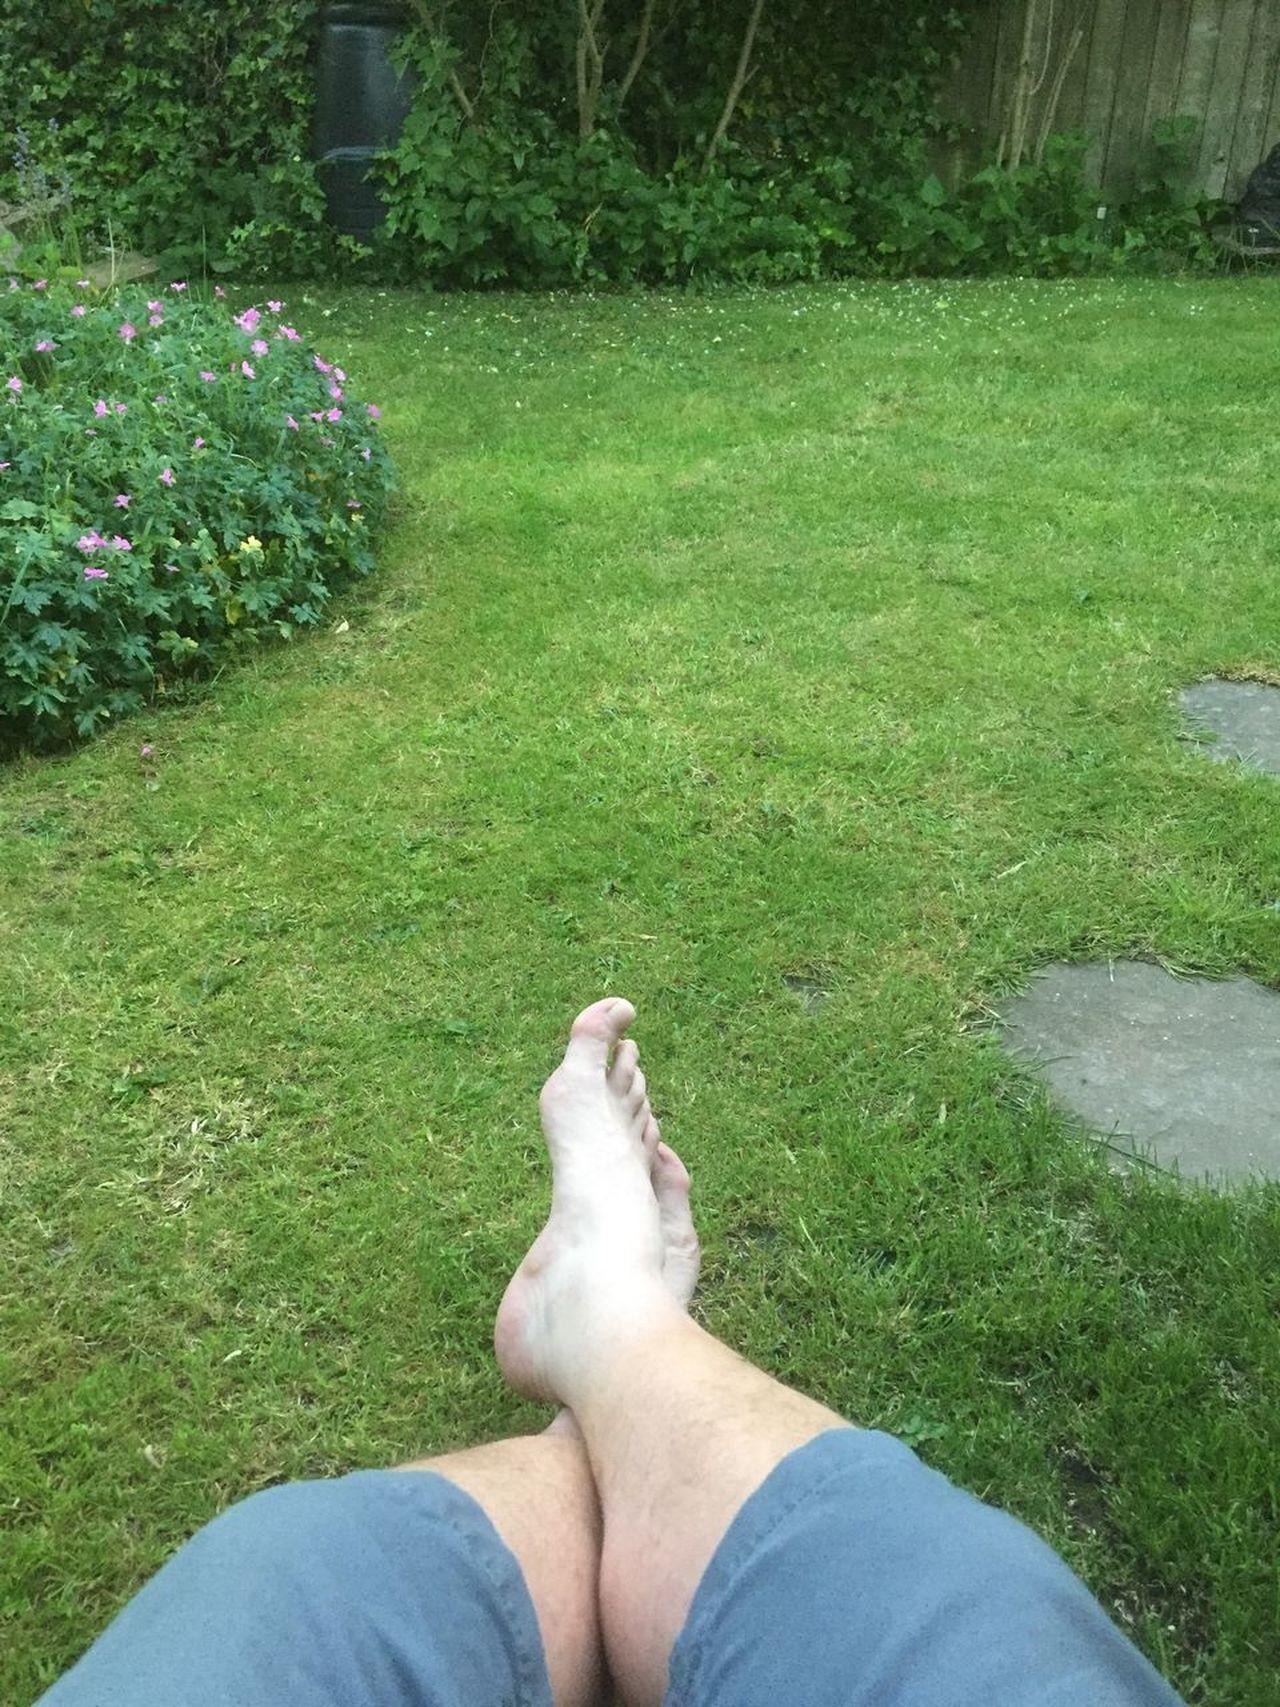 In my garden 😀